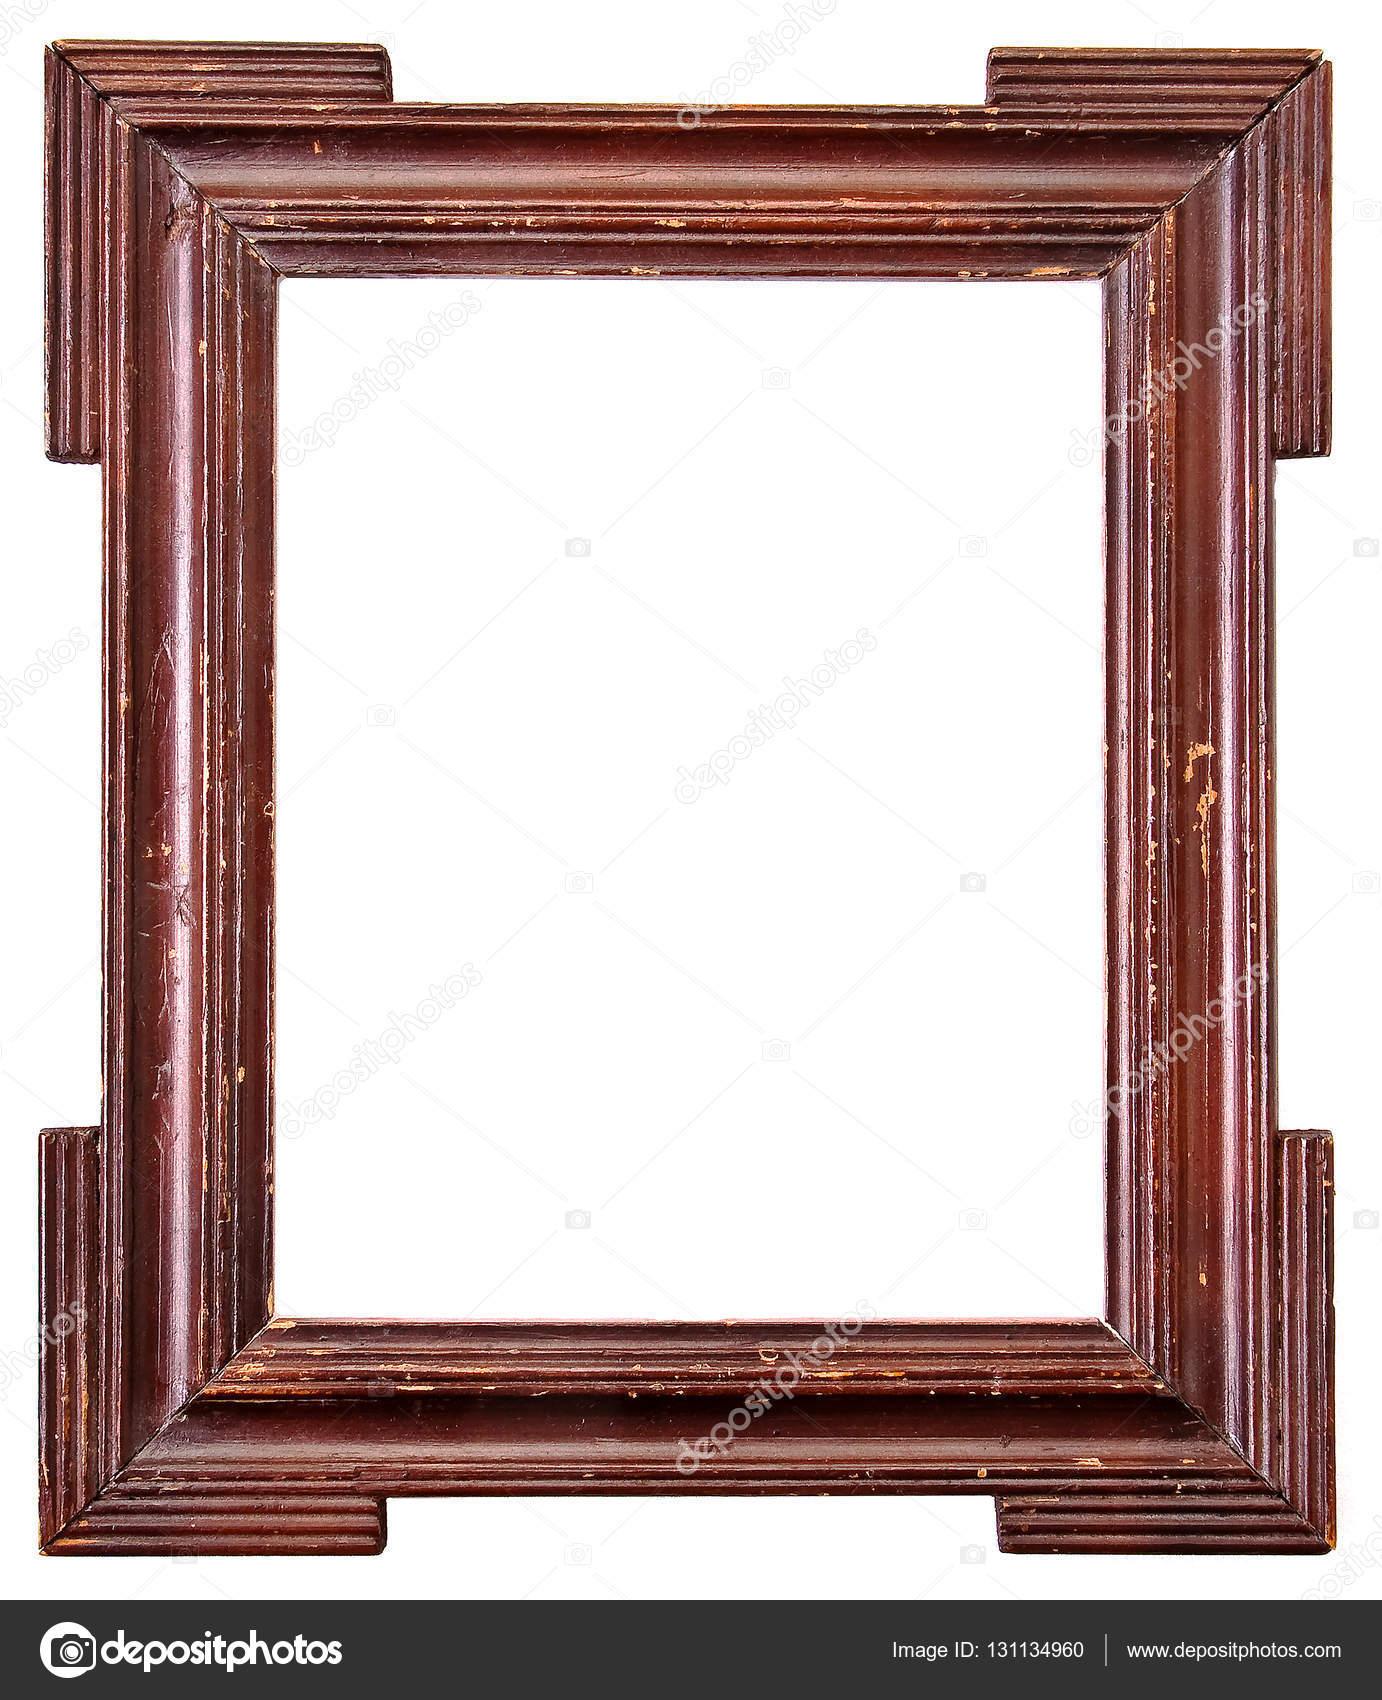 marco de madera antiguo — Foto de stock © SergeKa #131134960